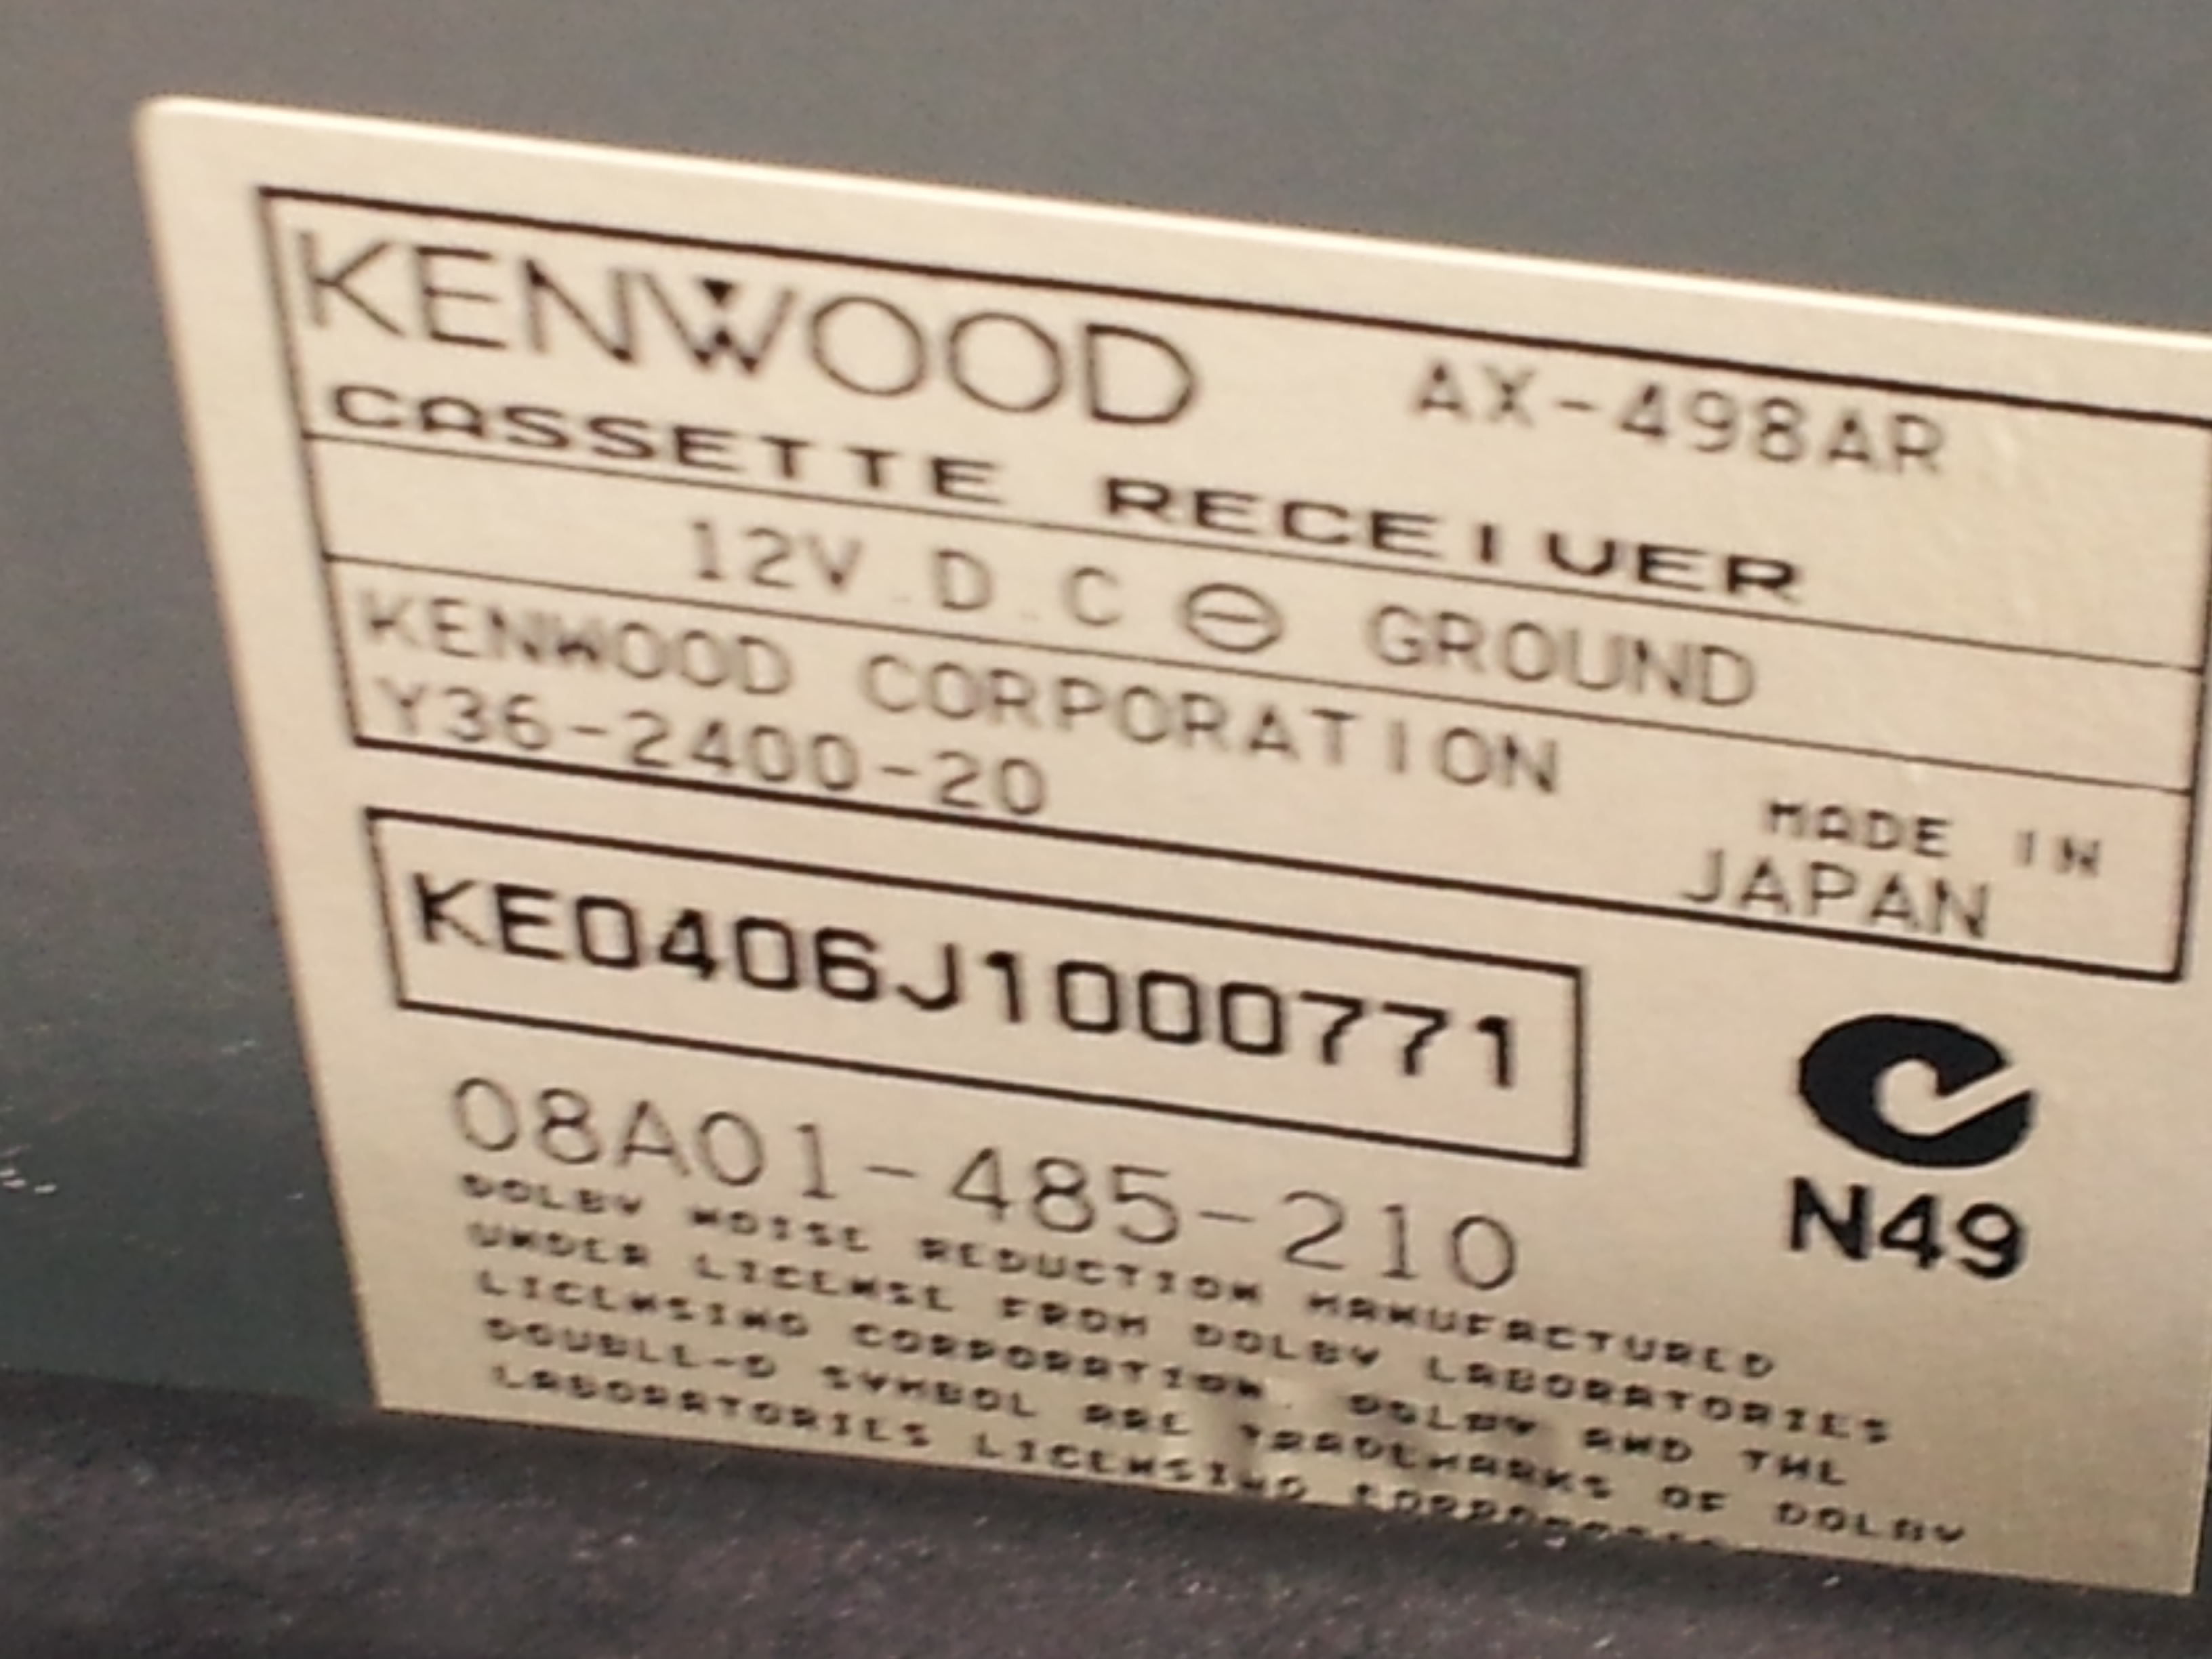 I Need The Radio Code For My 1998 Honda Civic I Am The Registered